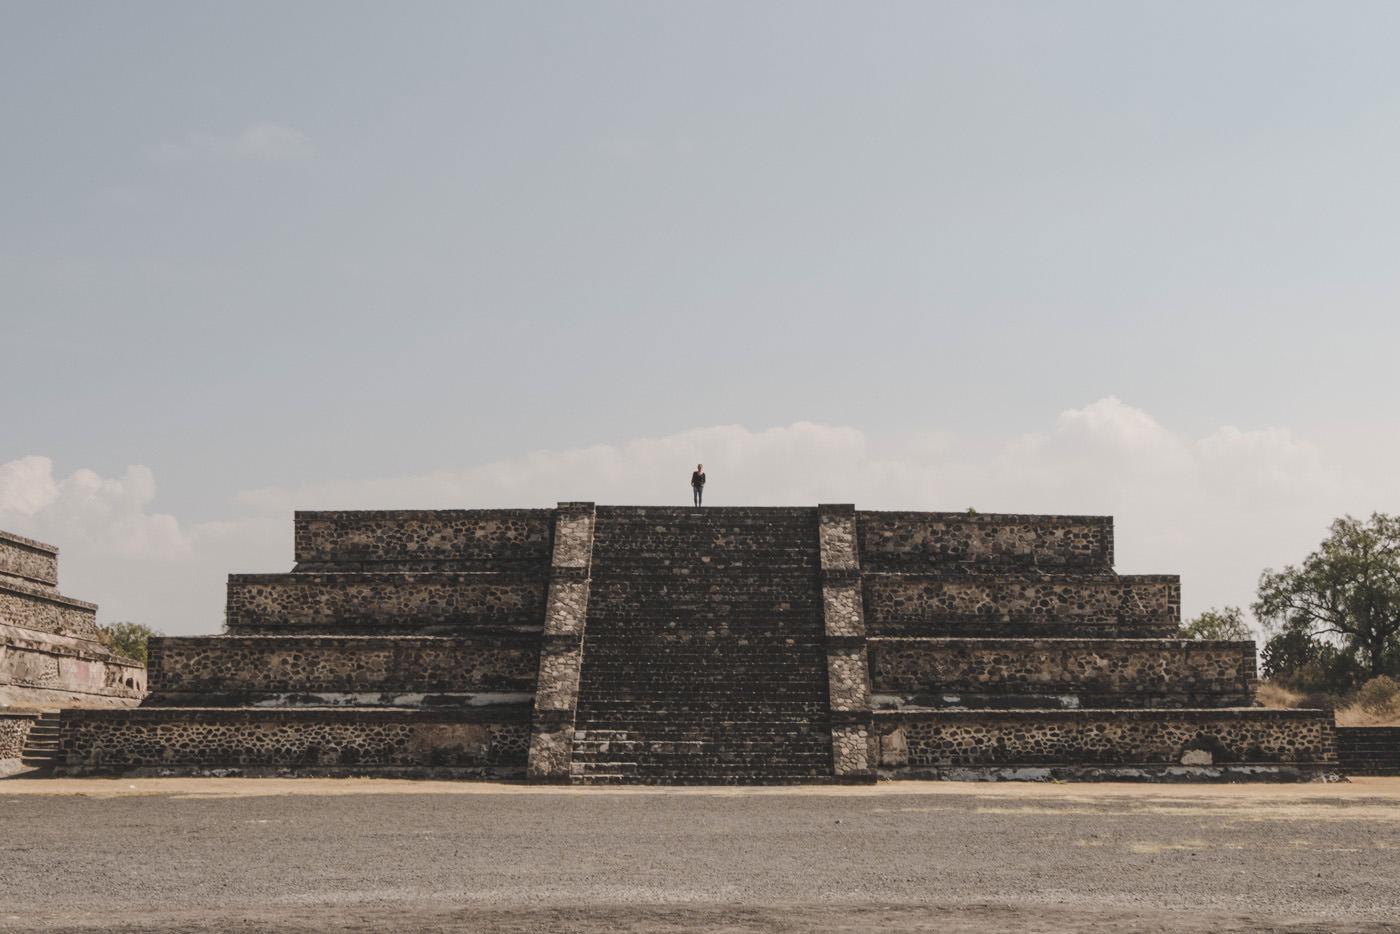 Julia bei den Pyramiden von Teotihuacan bei Mexiko-Stadt